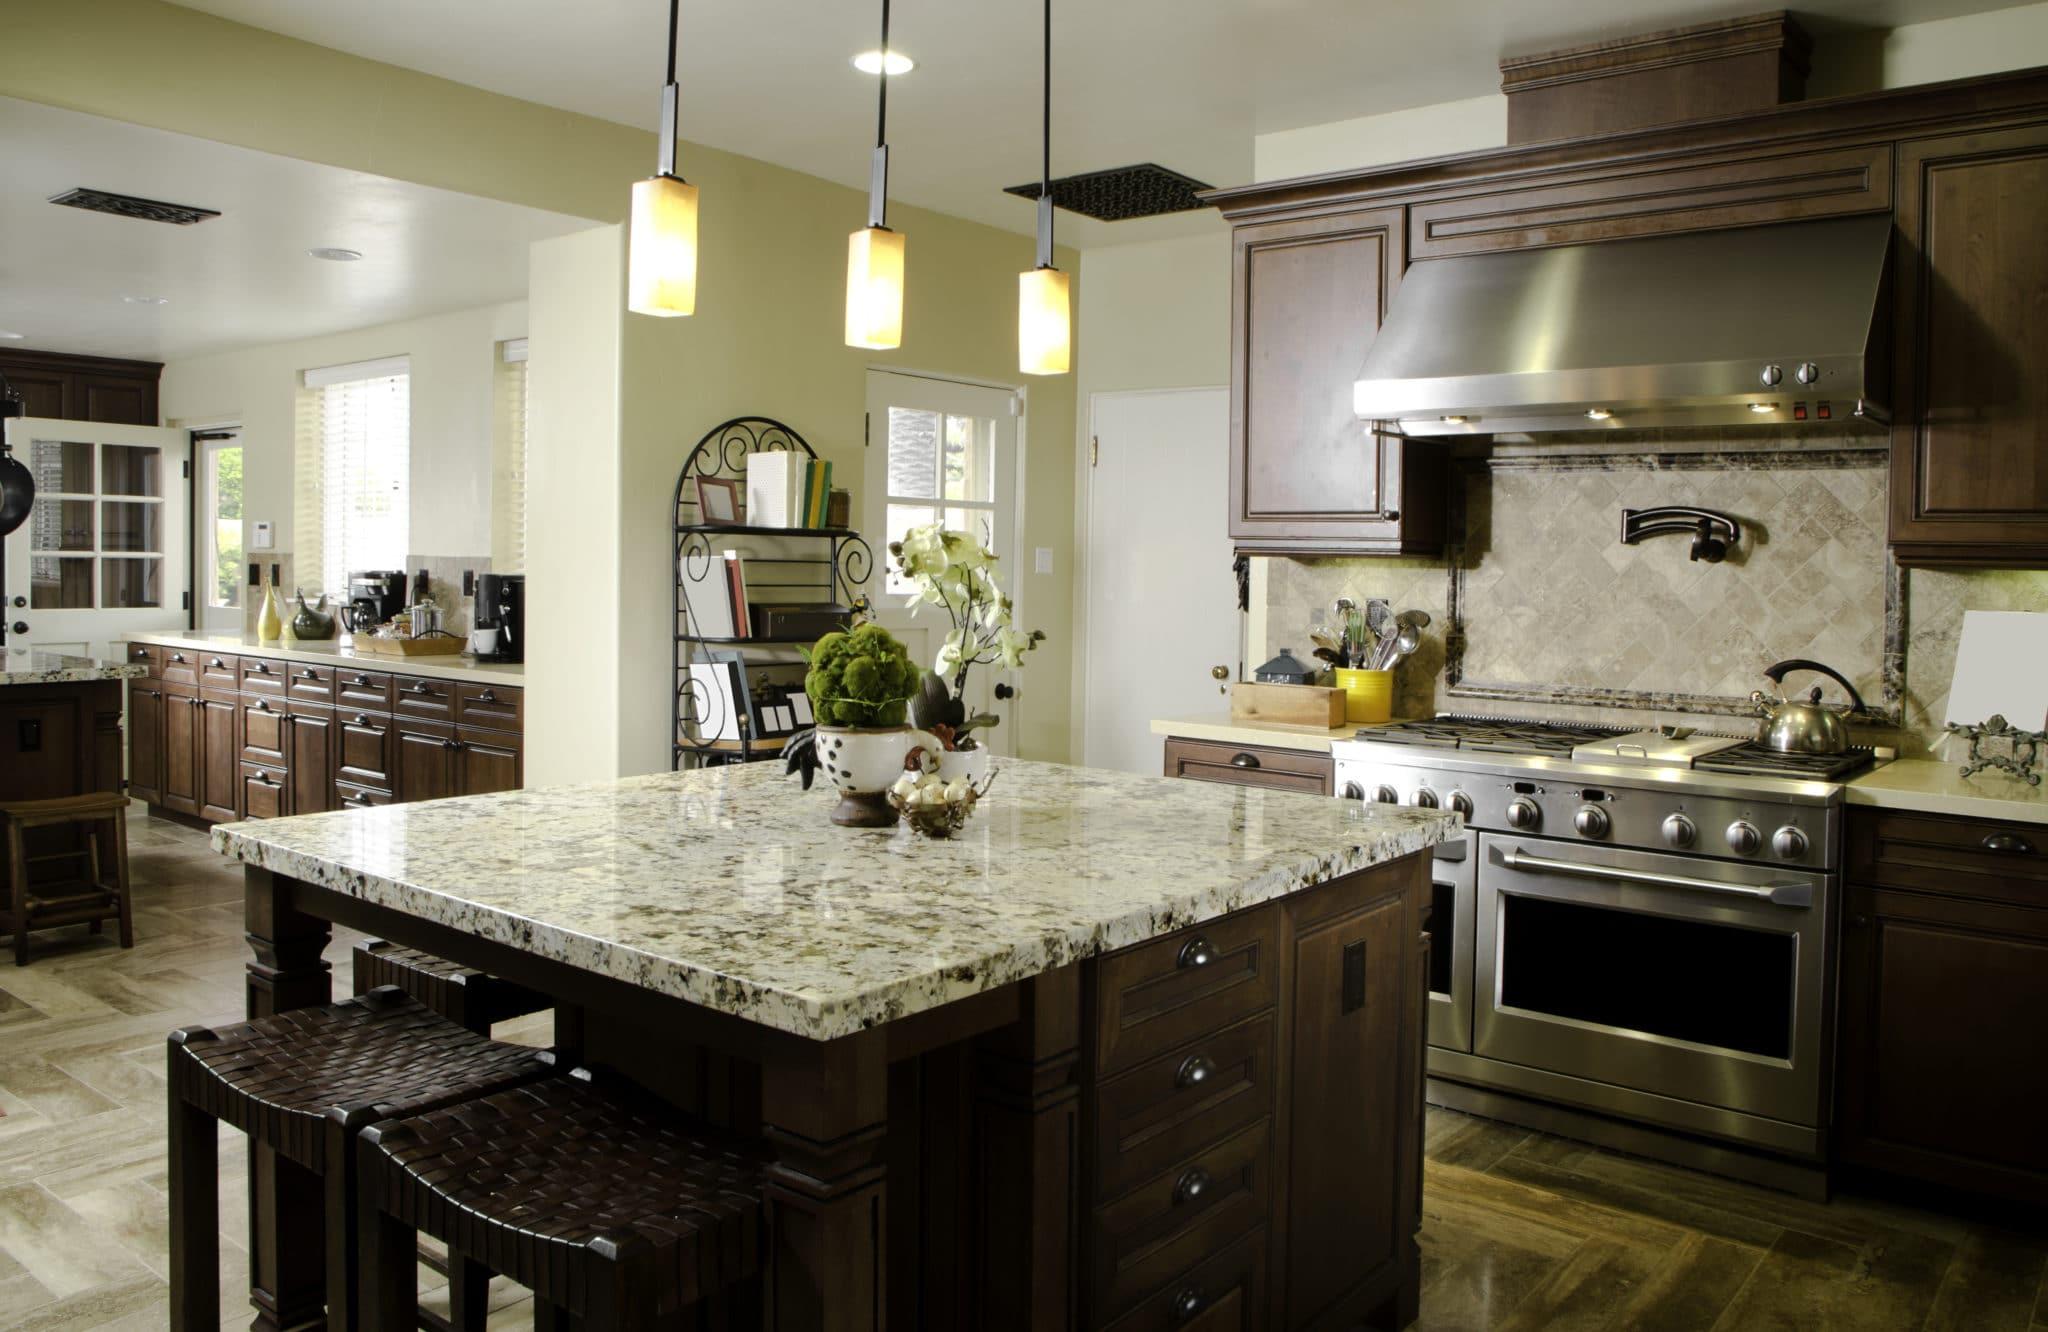 remodeling kitchen remodel contractors Riverside County CA Kitchen Remodeling Contractor